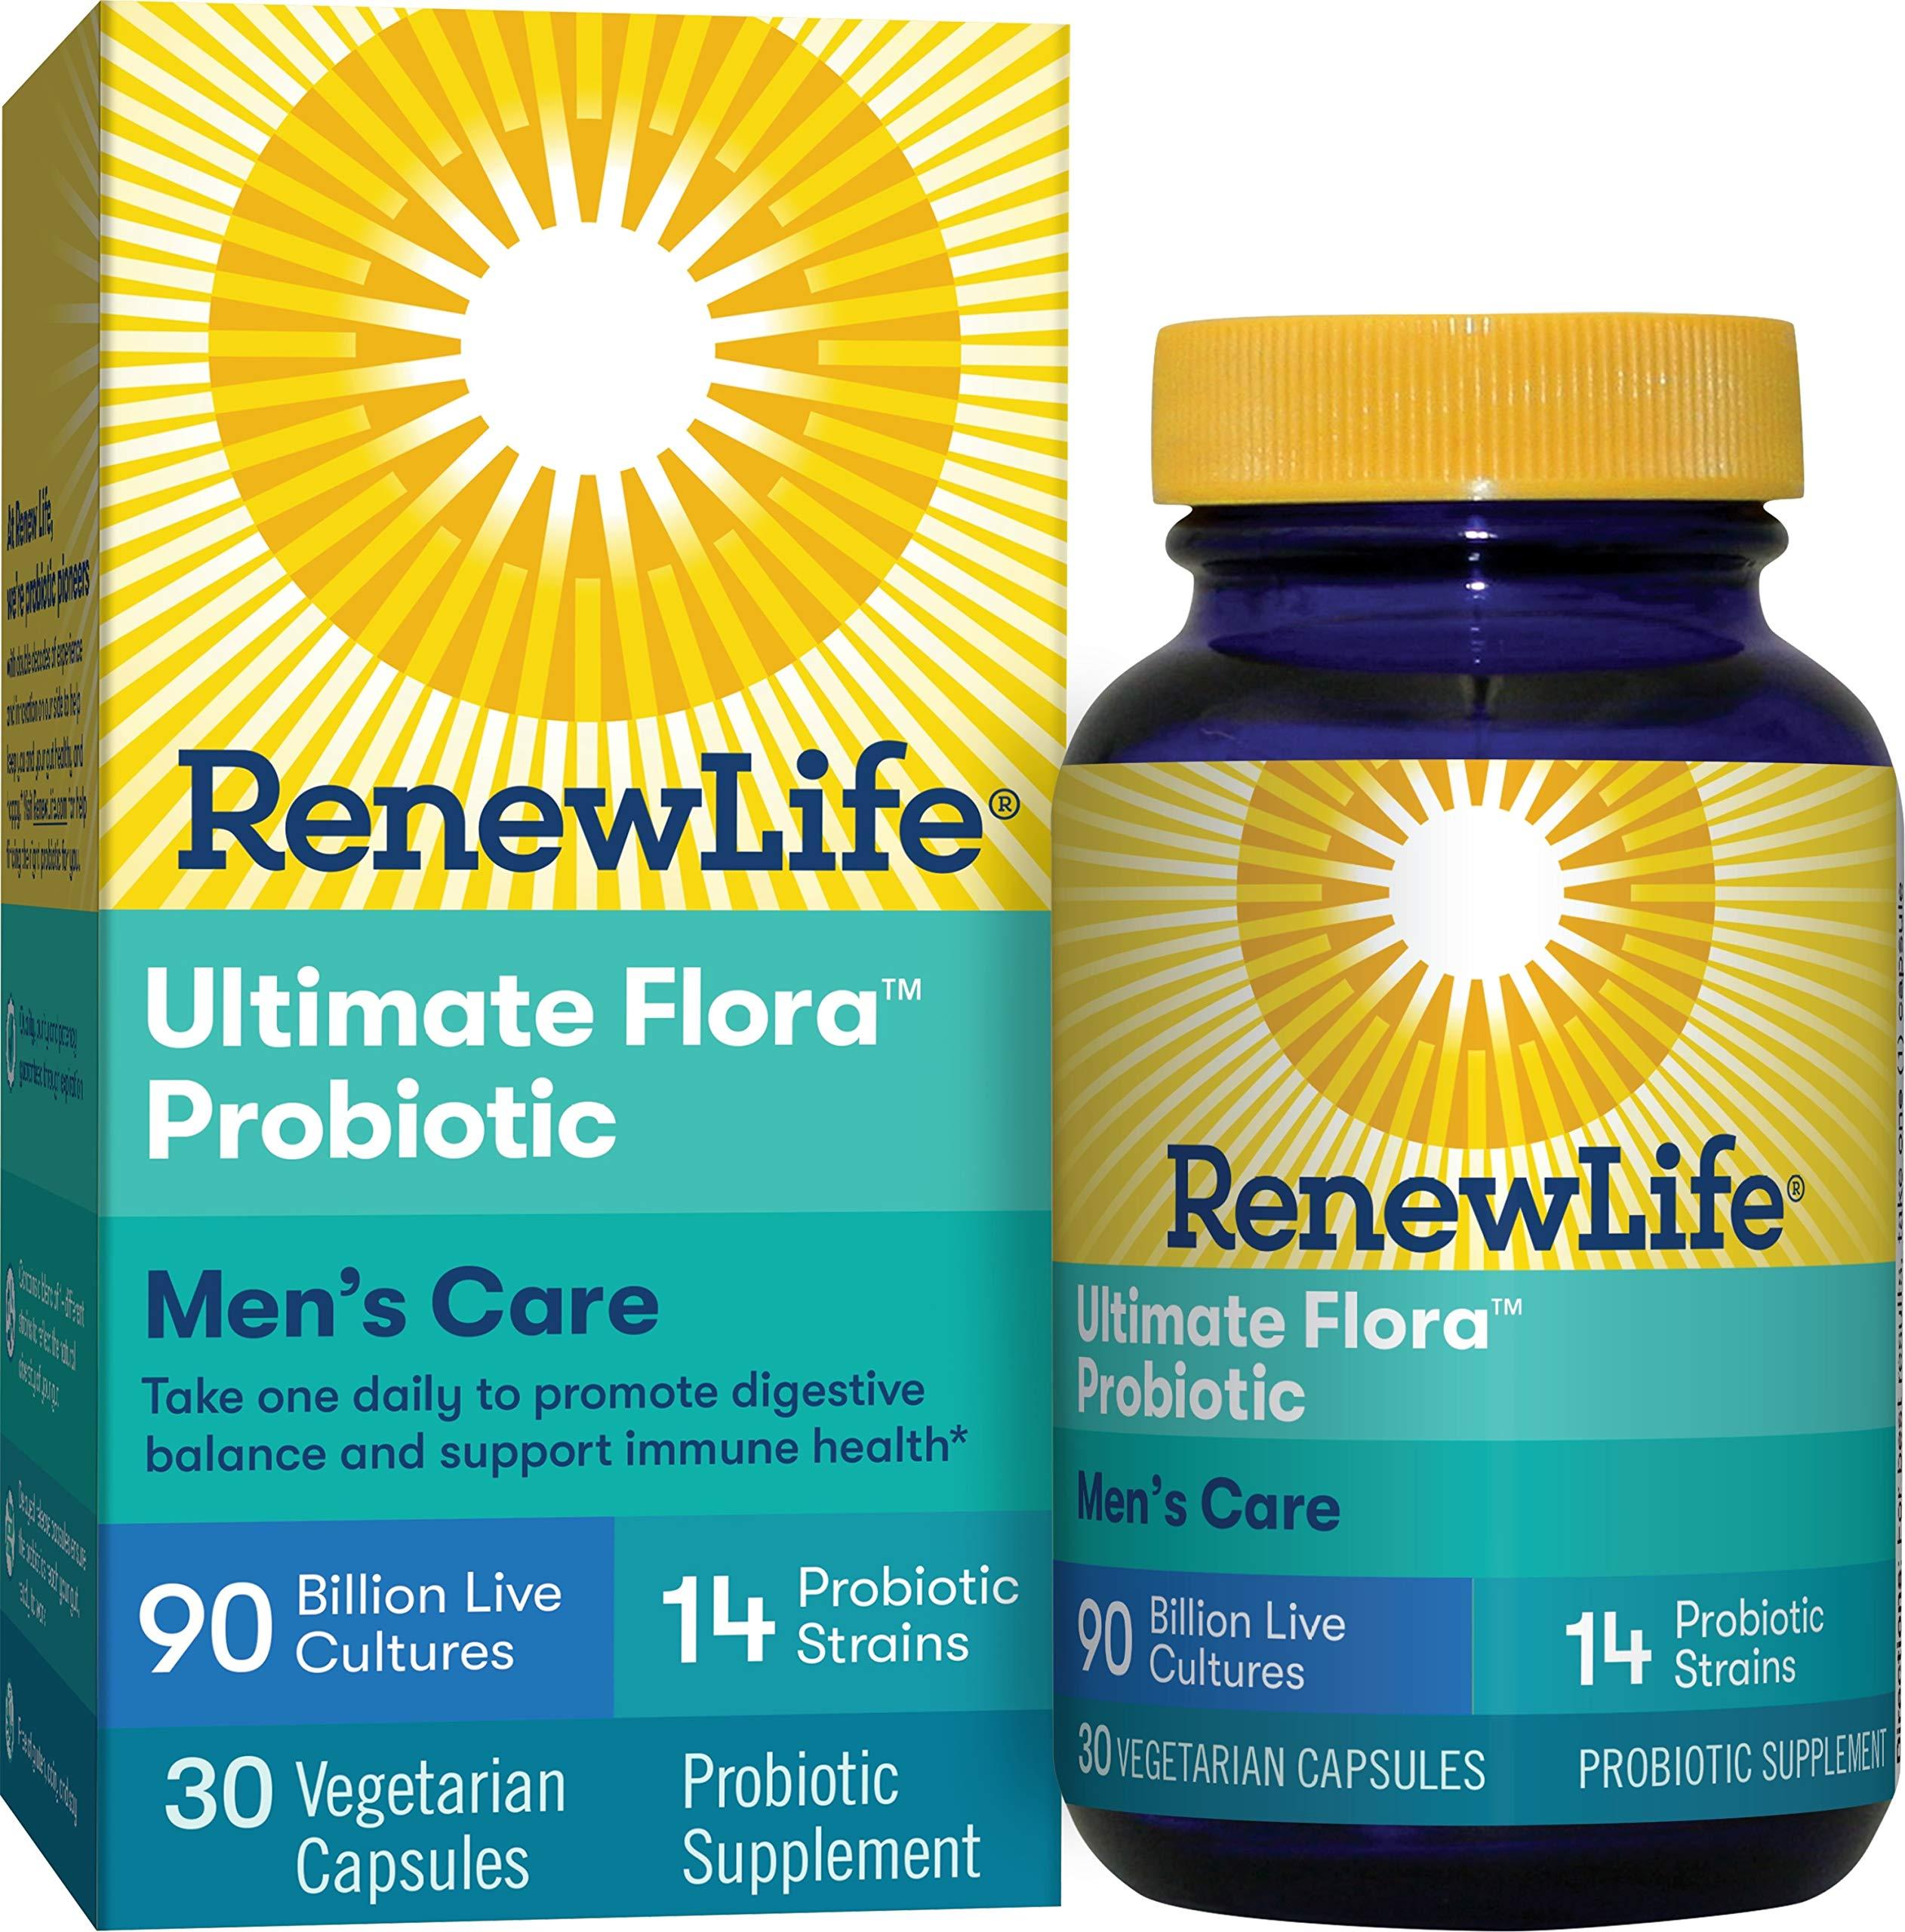 Renew Life Adult Probiotic - Ultimate Flora Men's Care Probiotic Supplement - Gluten, Dairy & Soy Free - 90 Billion CFU - 30 Vegetarian Capsules by Renew Life